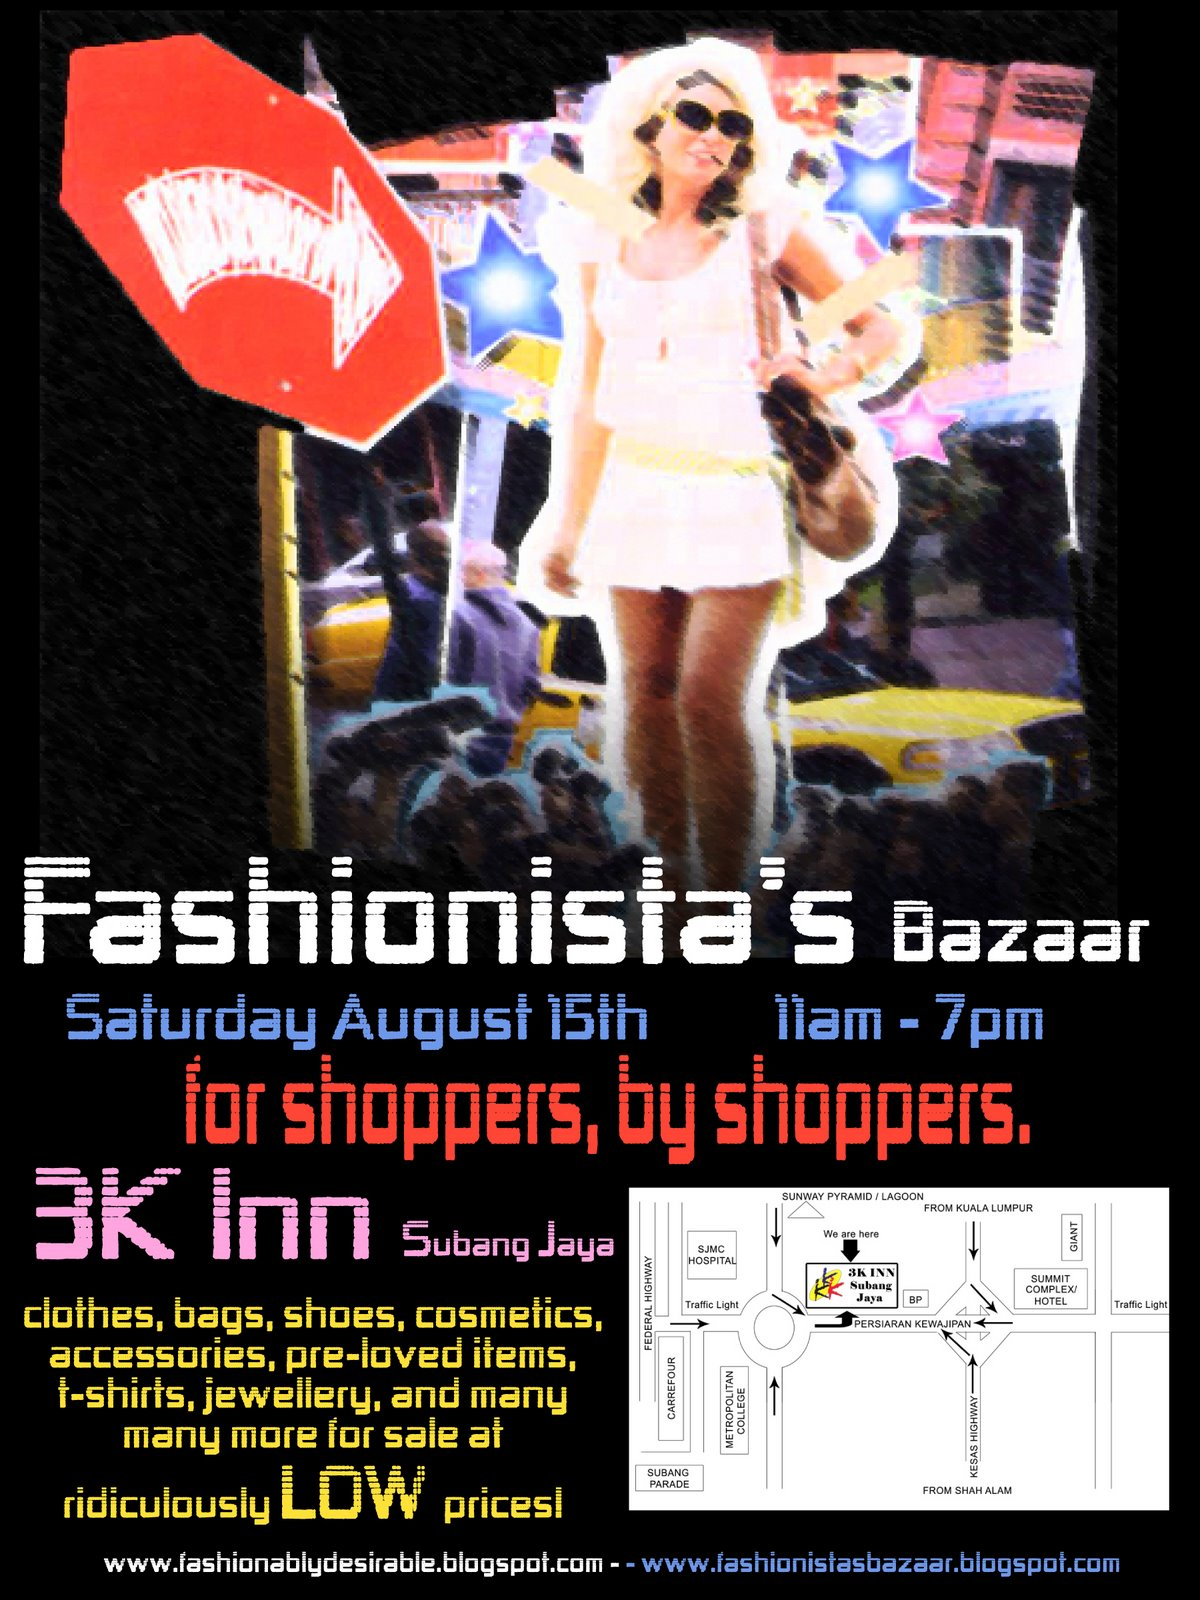 Fashionista's Bazaar